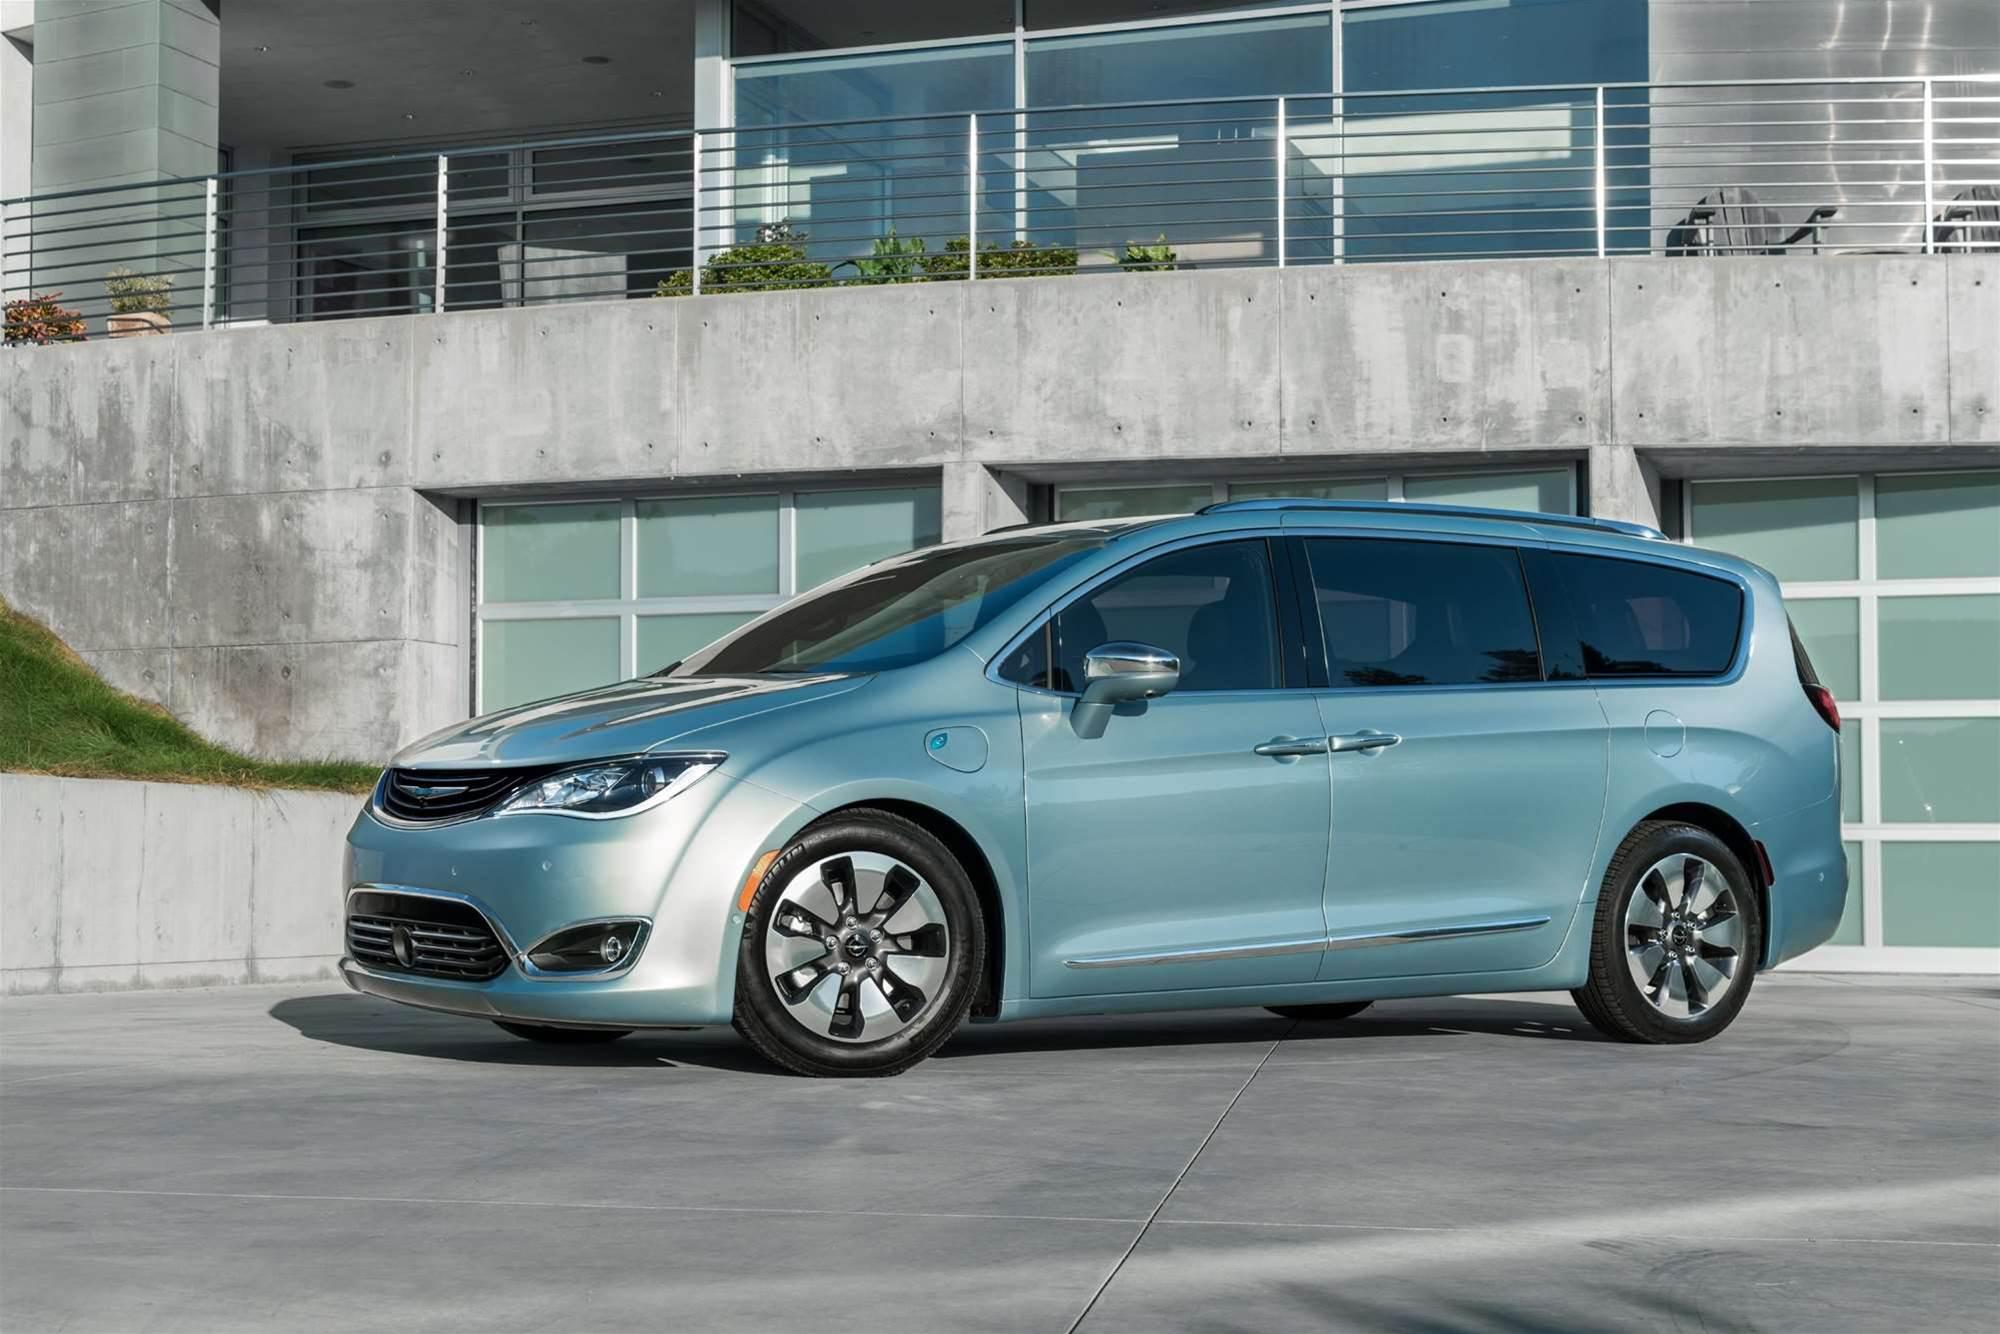 Google, Fiat to make 100 self-driving minivans